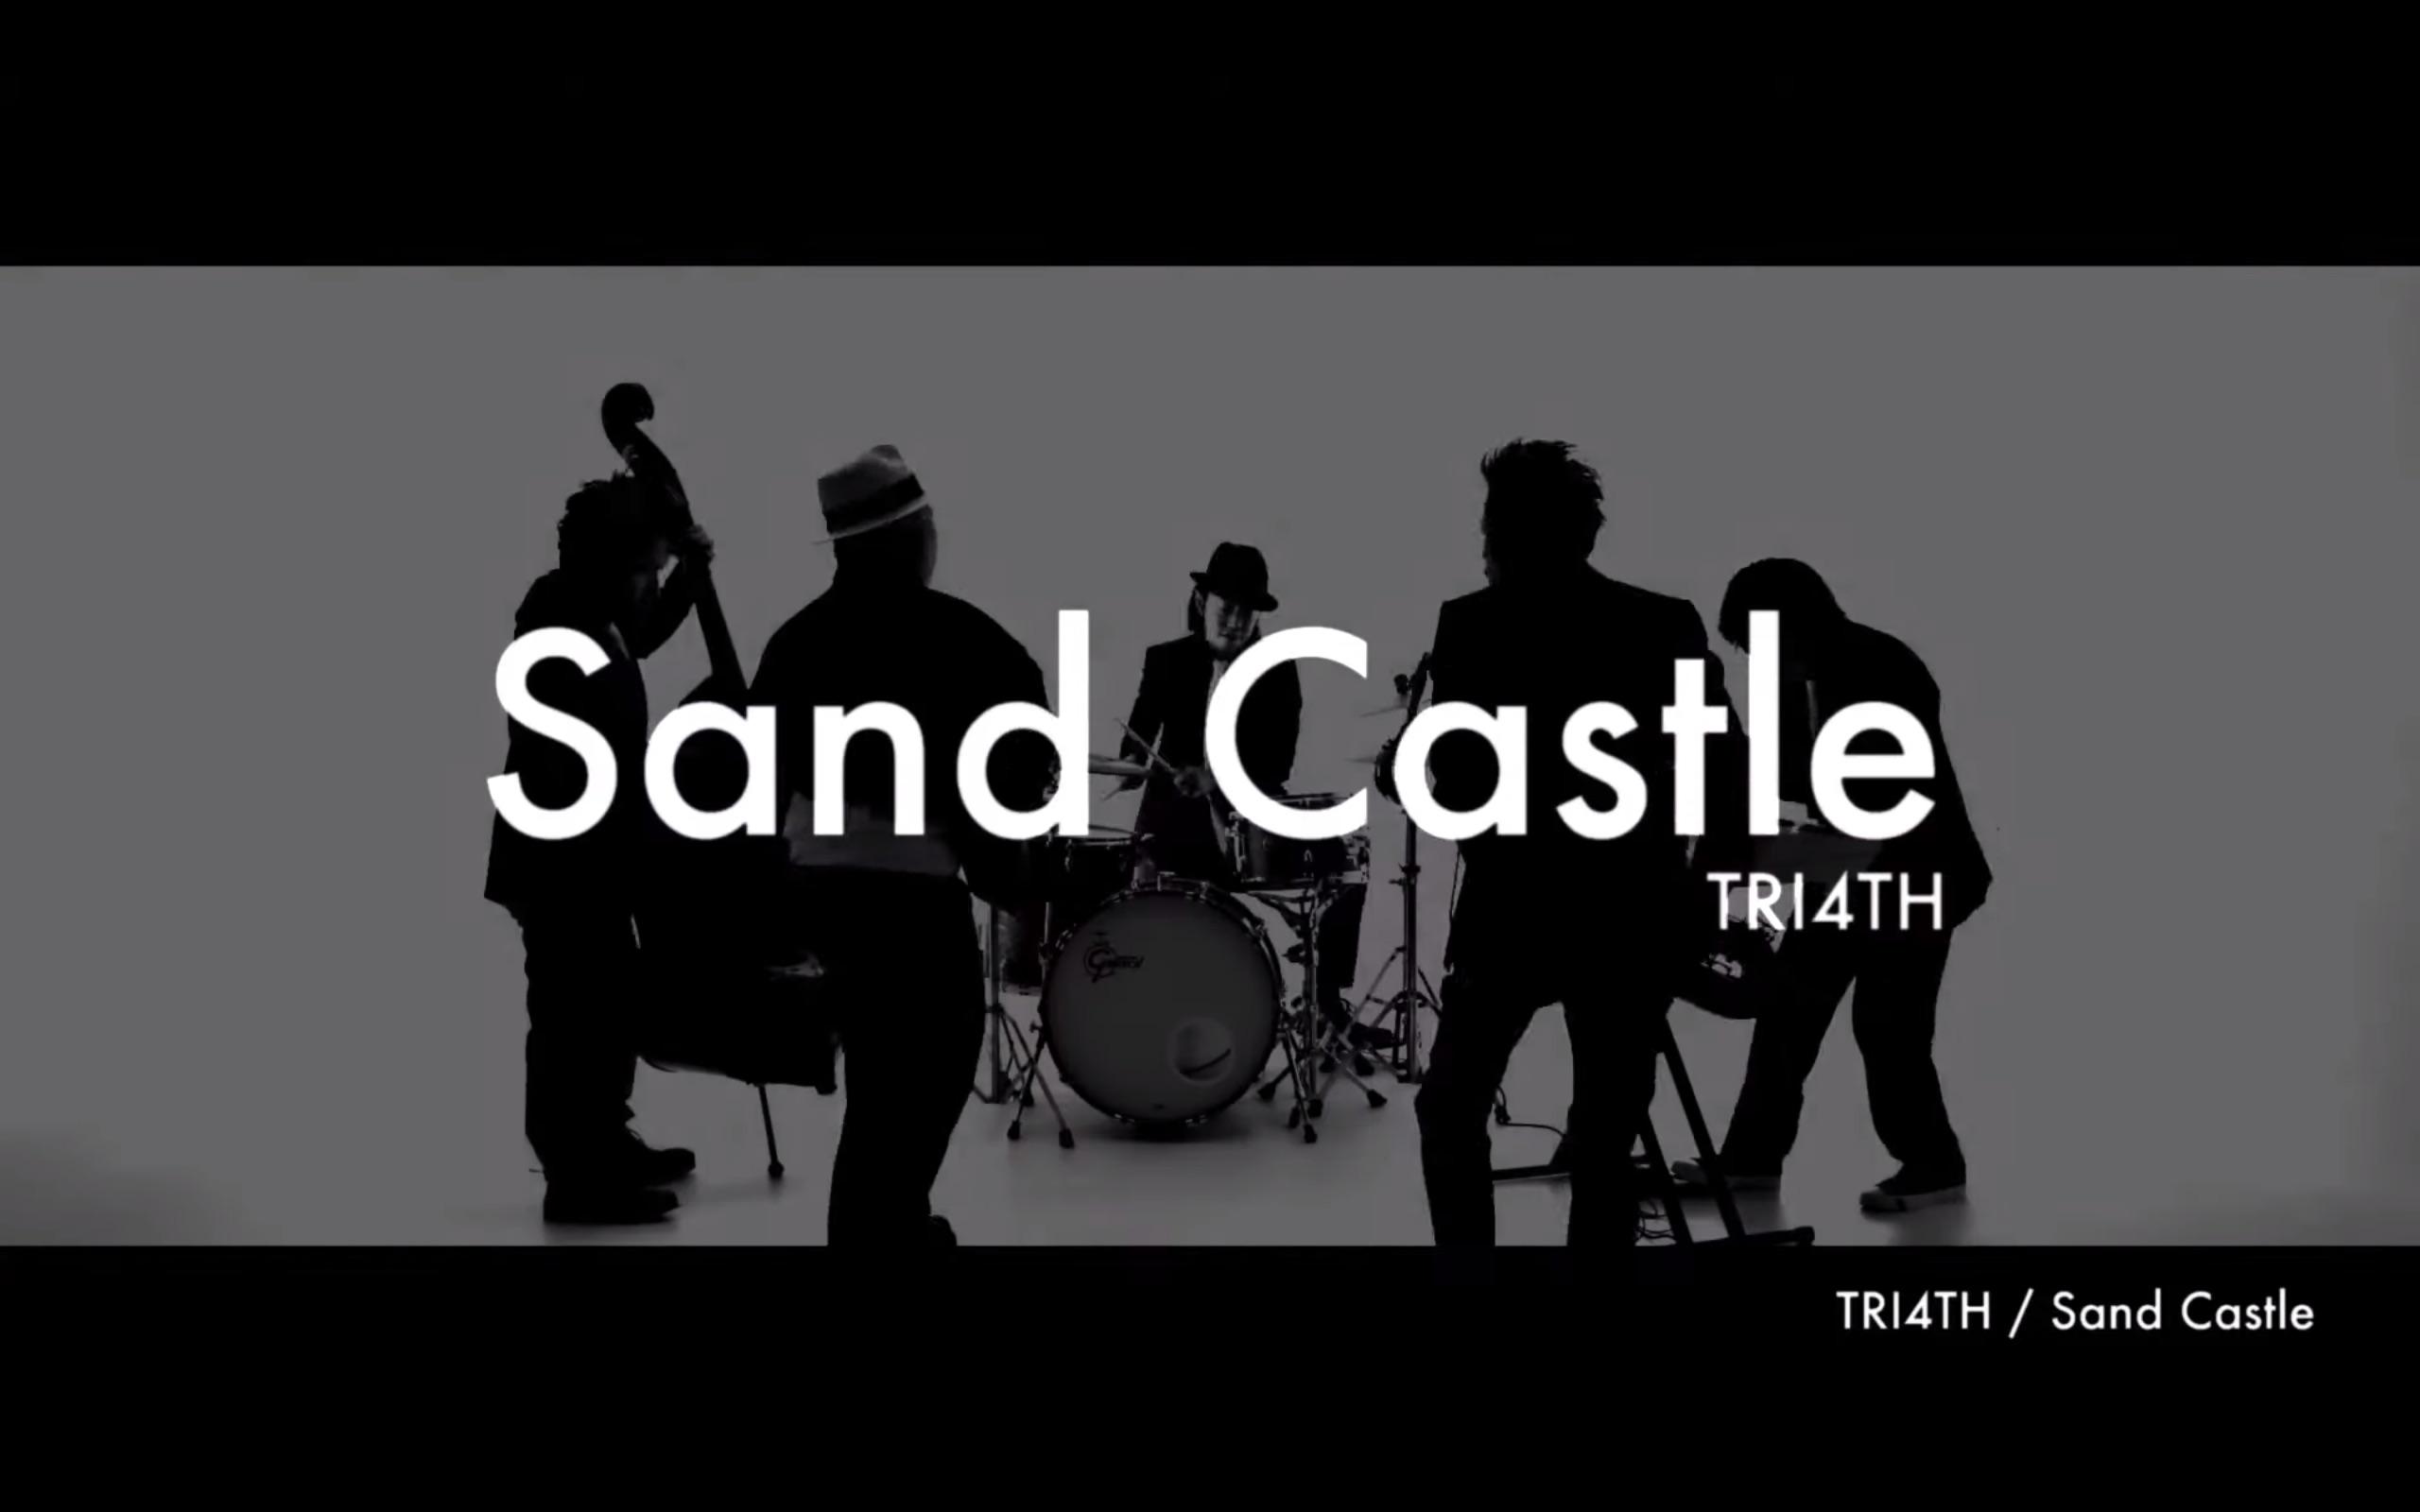 Sand Castle / TRI4TH